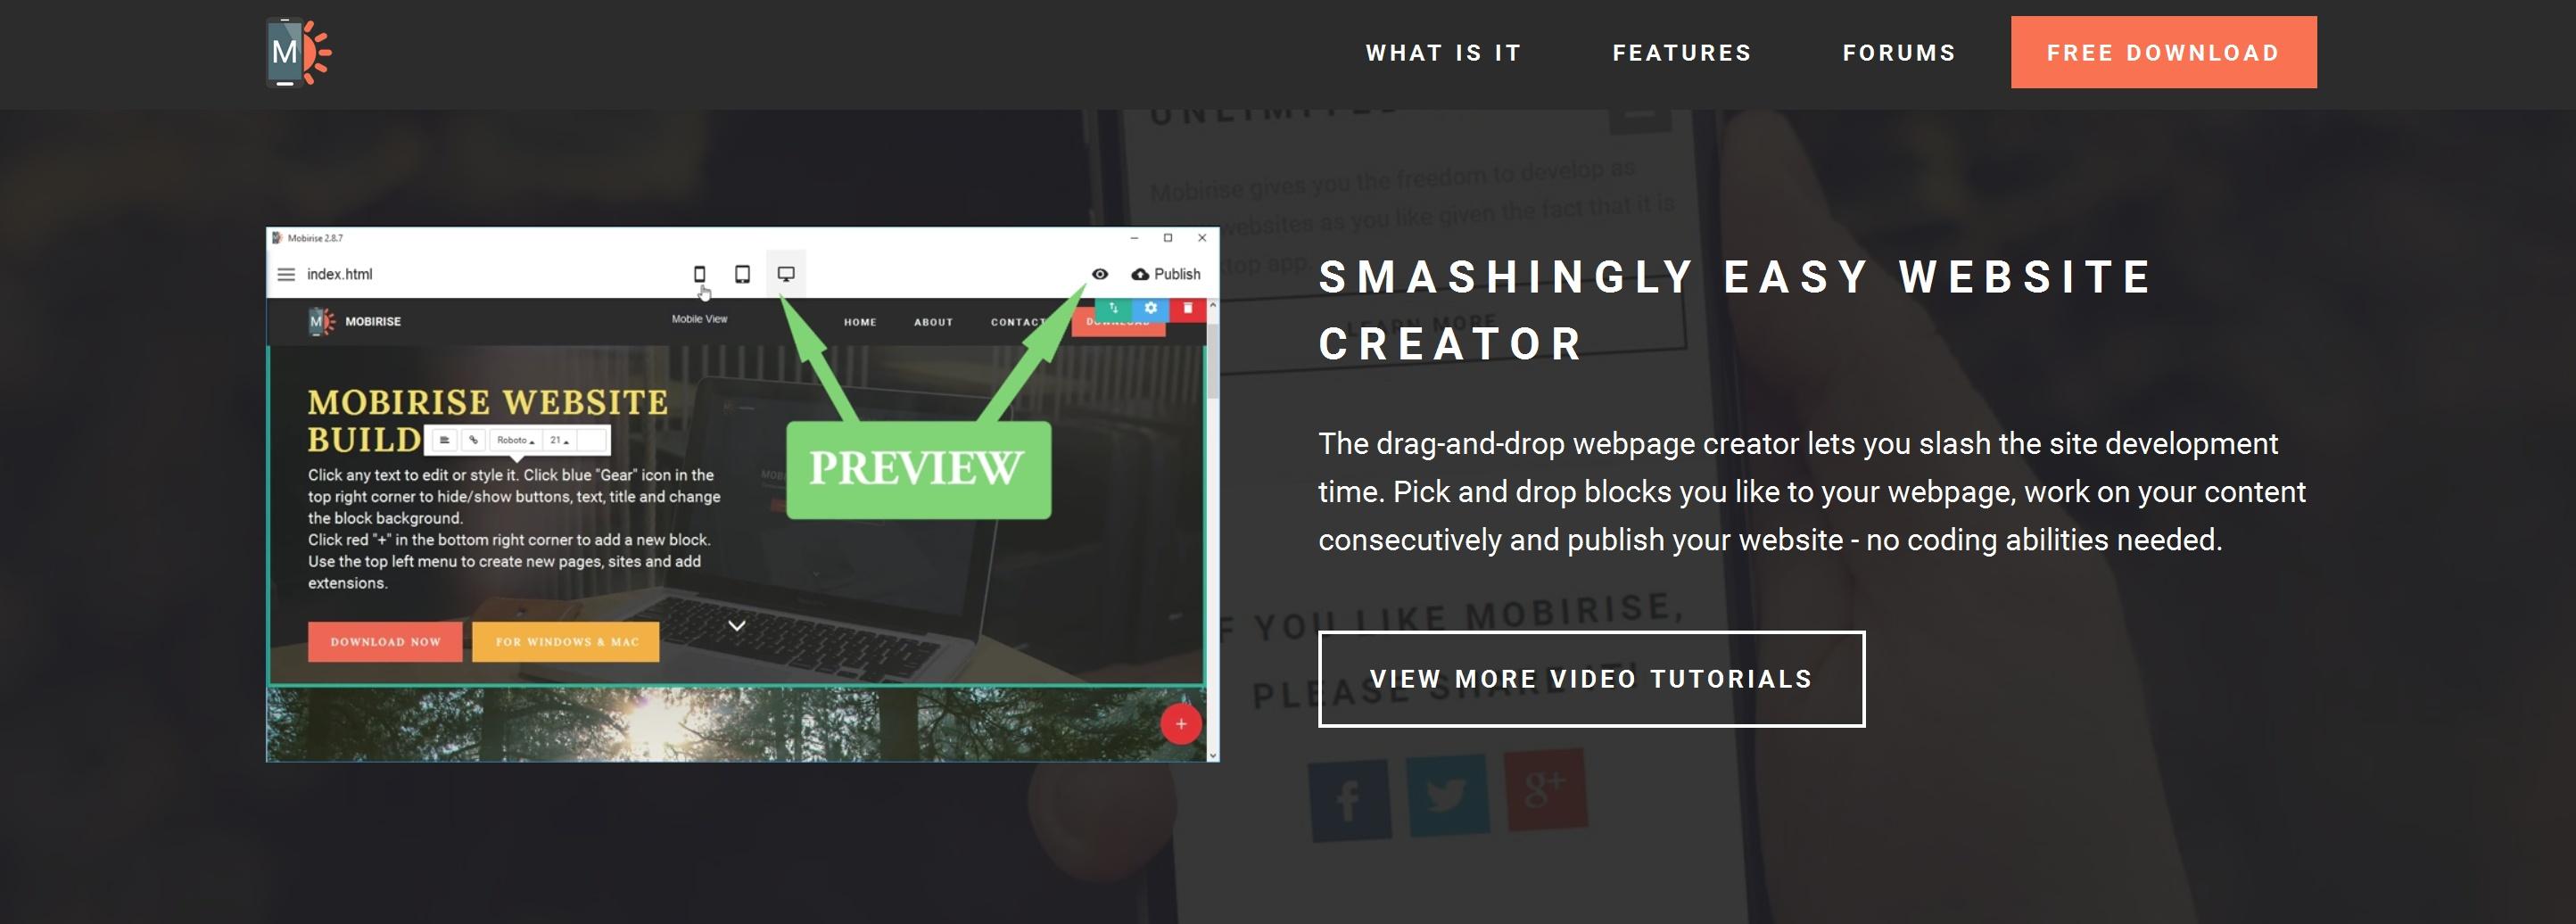 Very Simple Website Creator